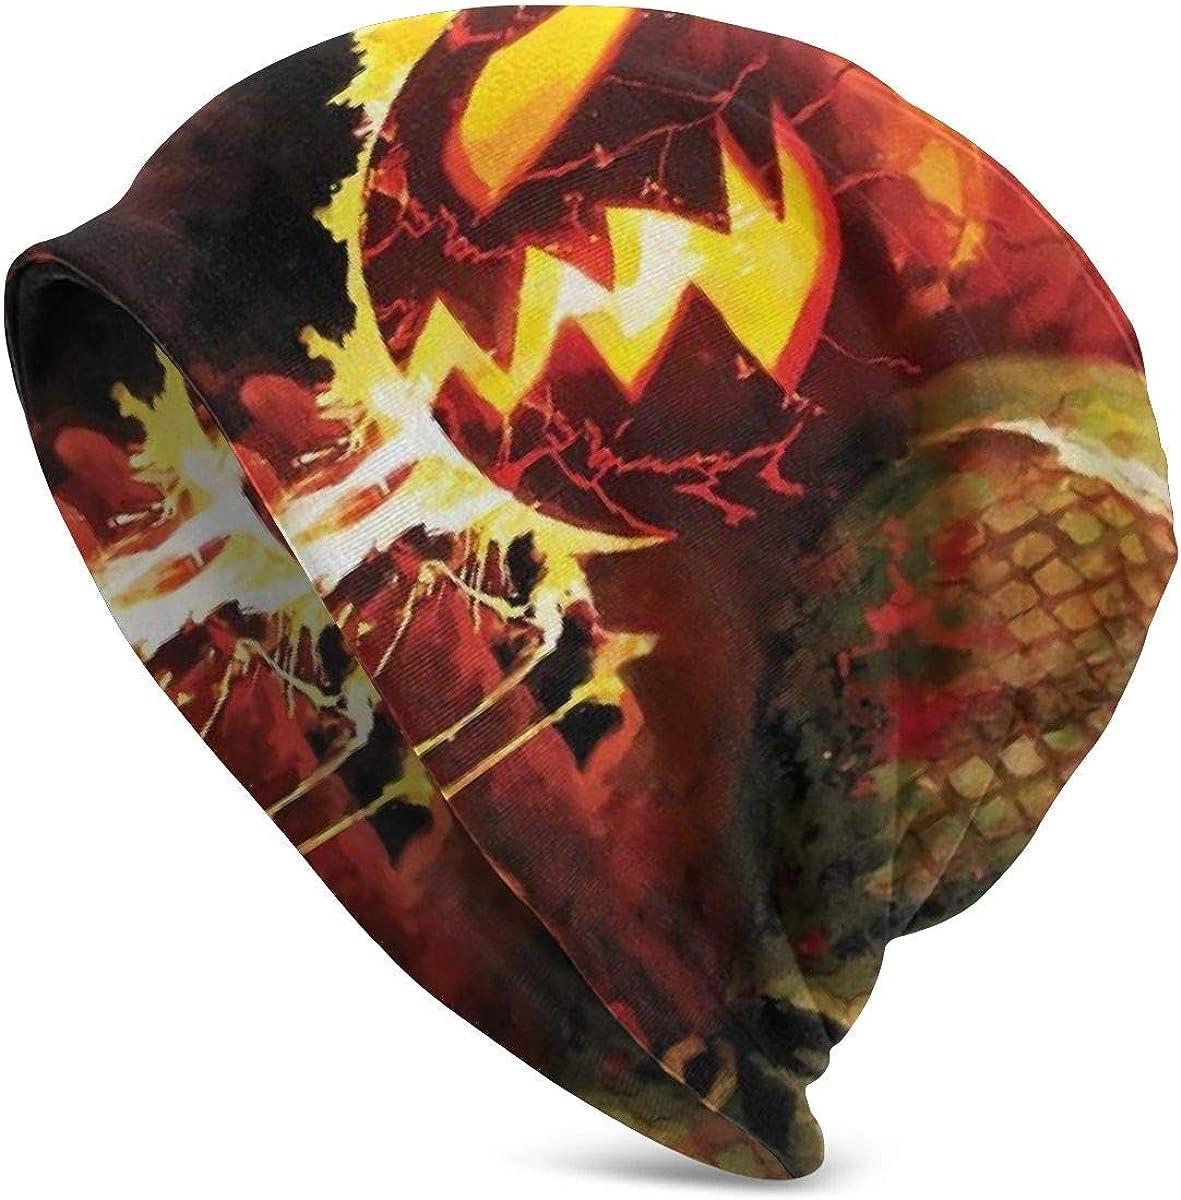 Pumpkin Ghost Rider Skull Unisex Men Women Baggy Soft Slouchy Beanie Hat Summer Winter Skull Cap Hip-hop Knit Ski Hat Black